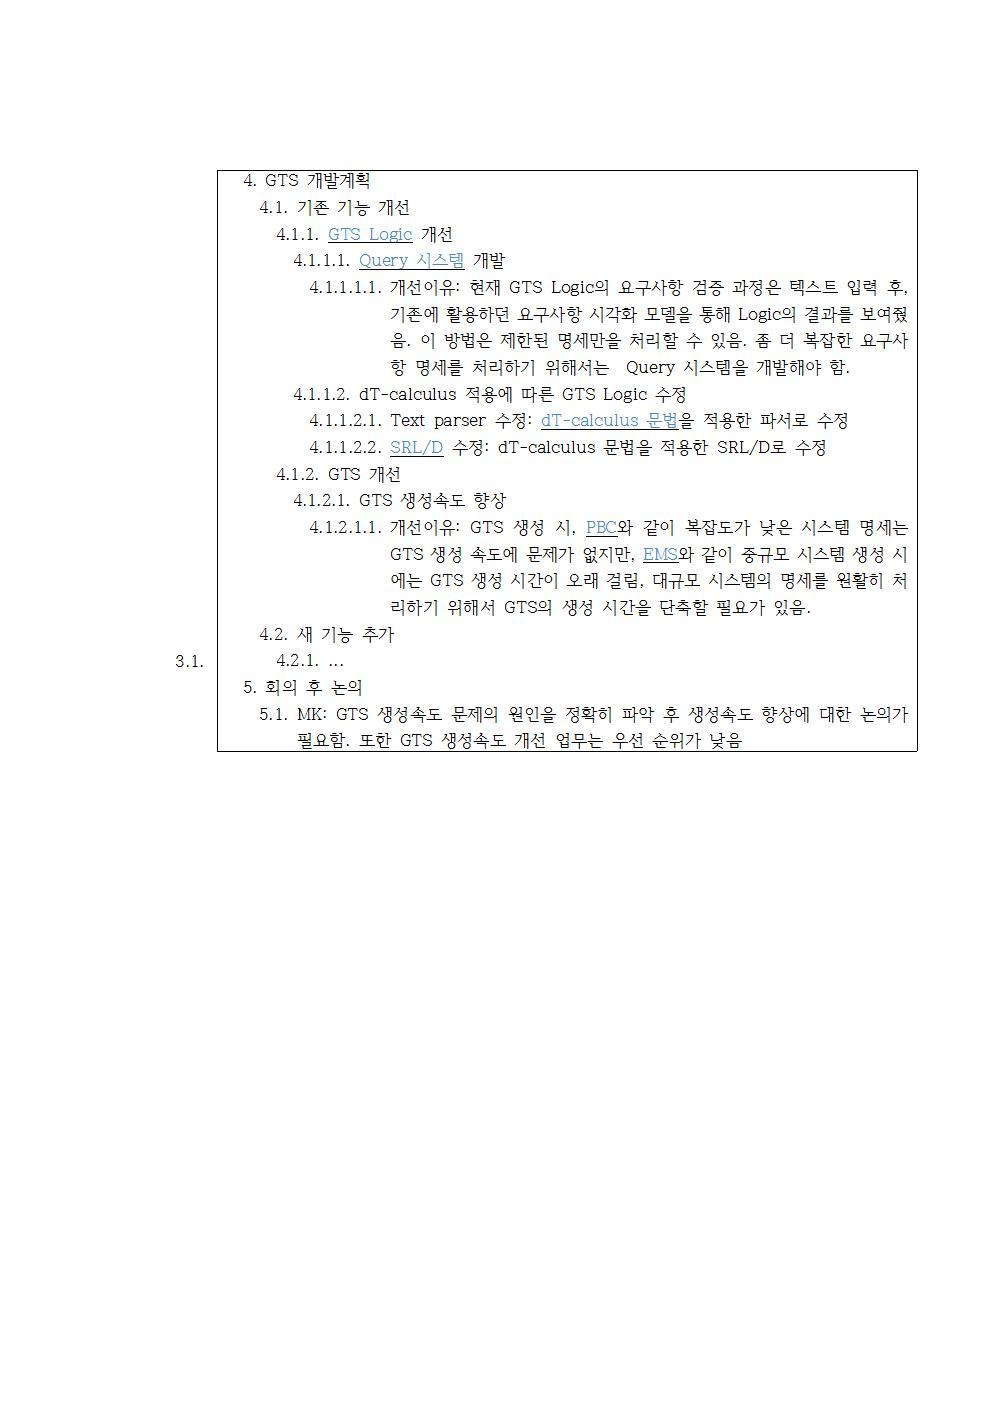 D-[17-005-RD-01]-[SAVE2.0-ADOxx]-[SH]-[2017-12-21]002.jpg